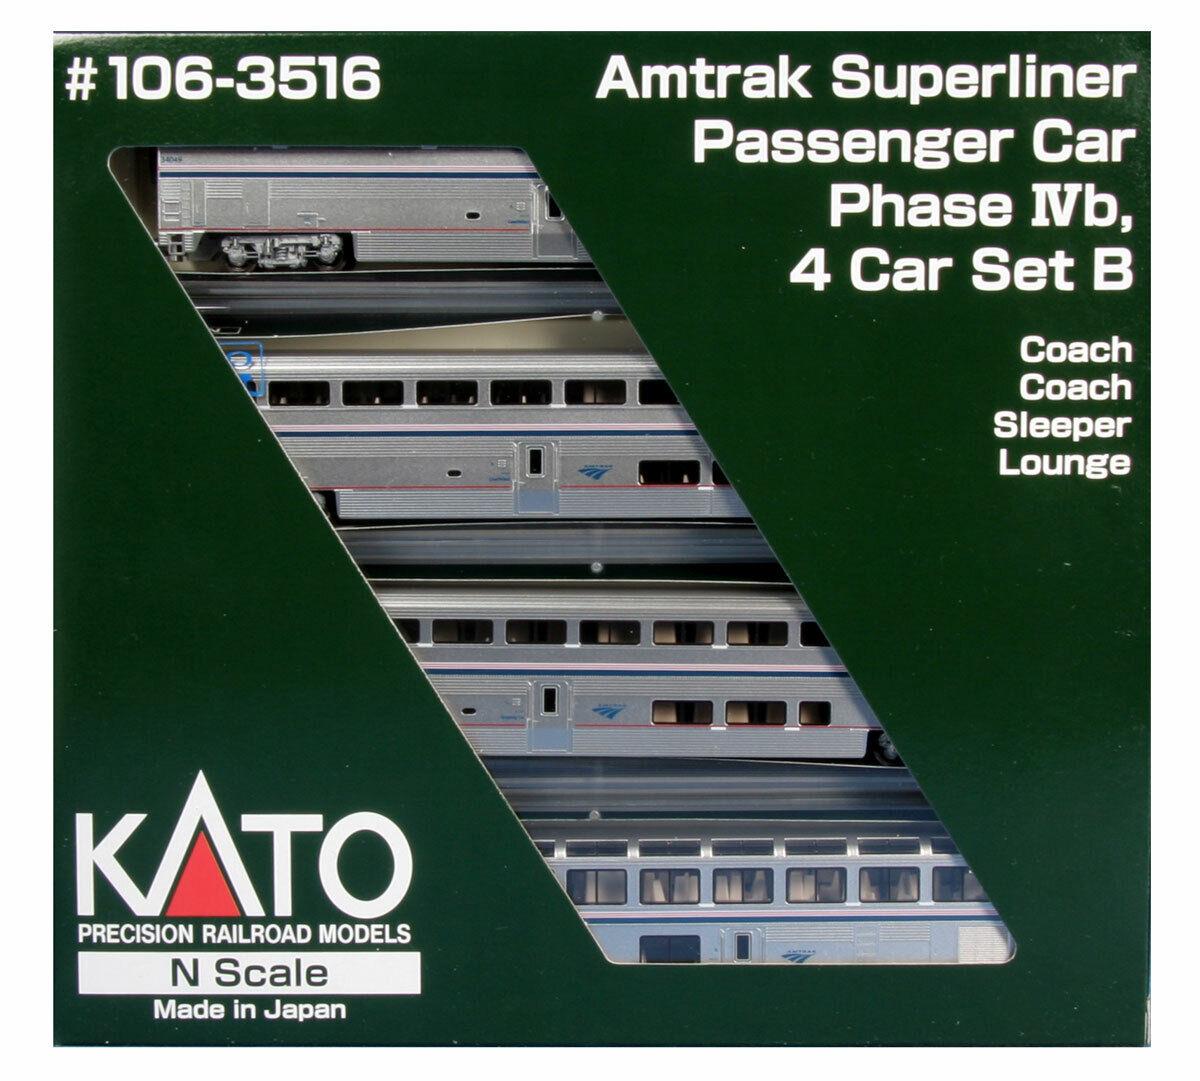 Kato N Scale 1063516 súperliner Amtrak Fase estadio 4-Coche Set B